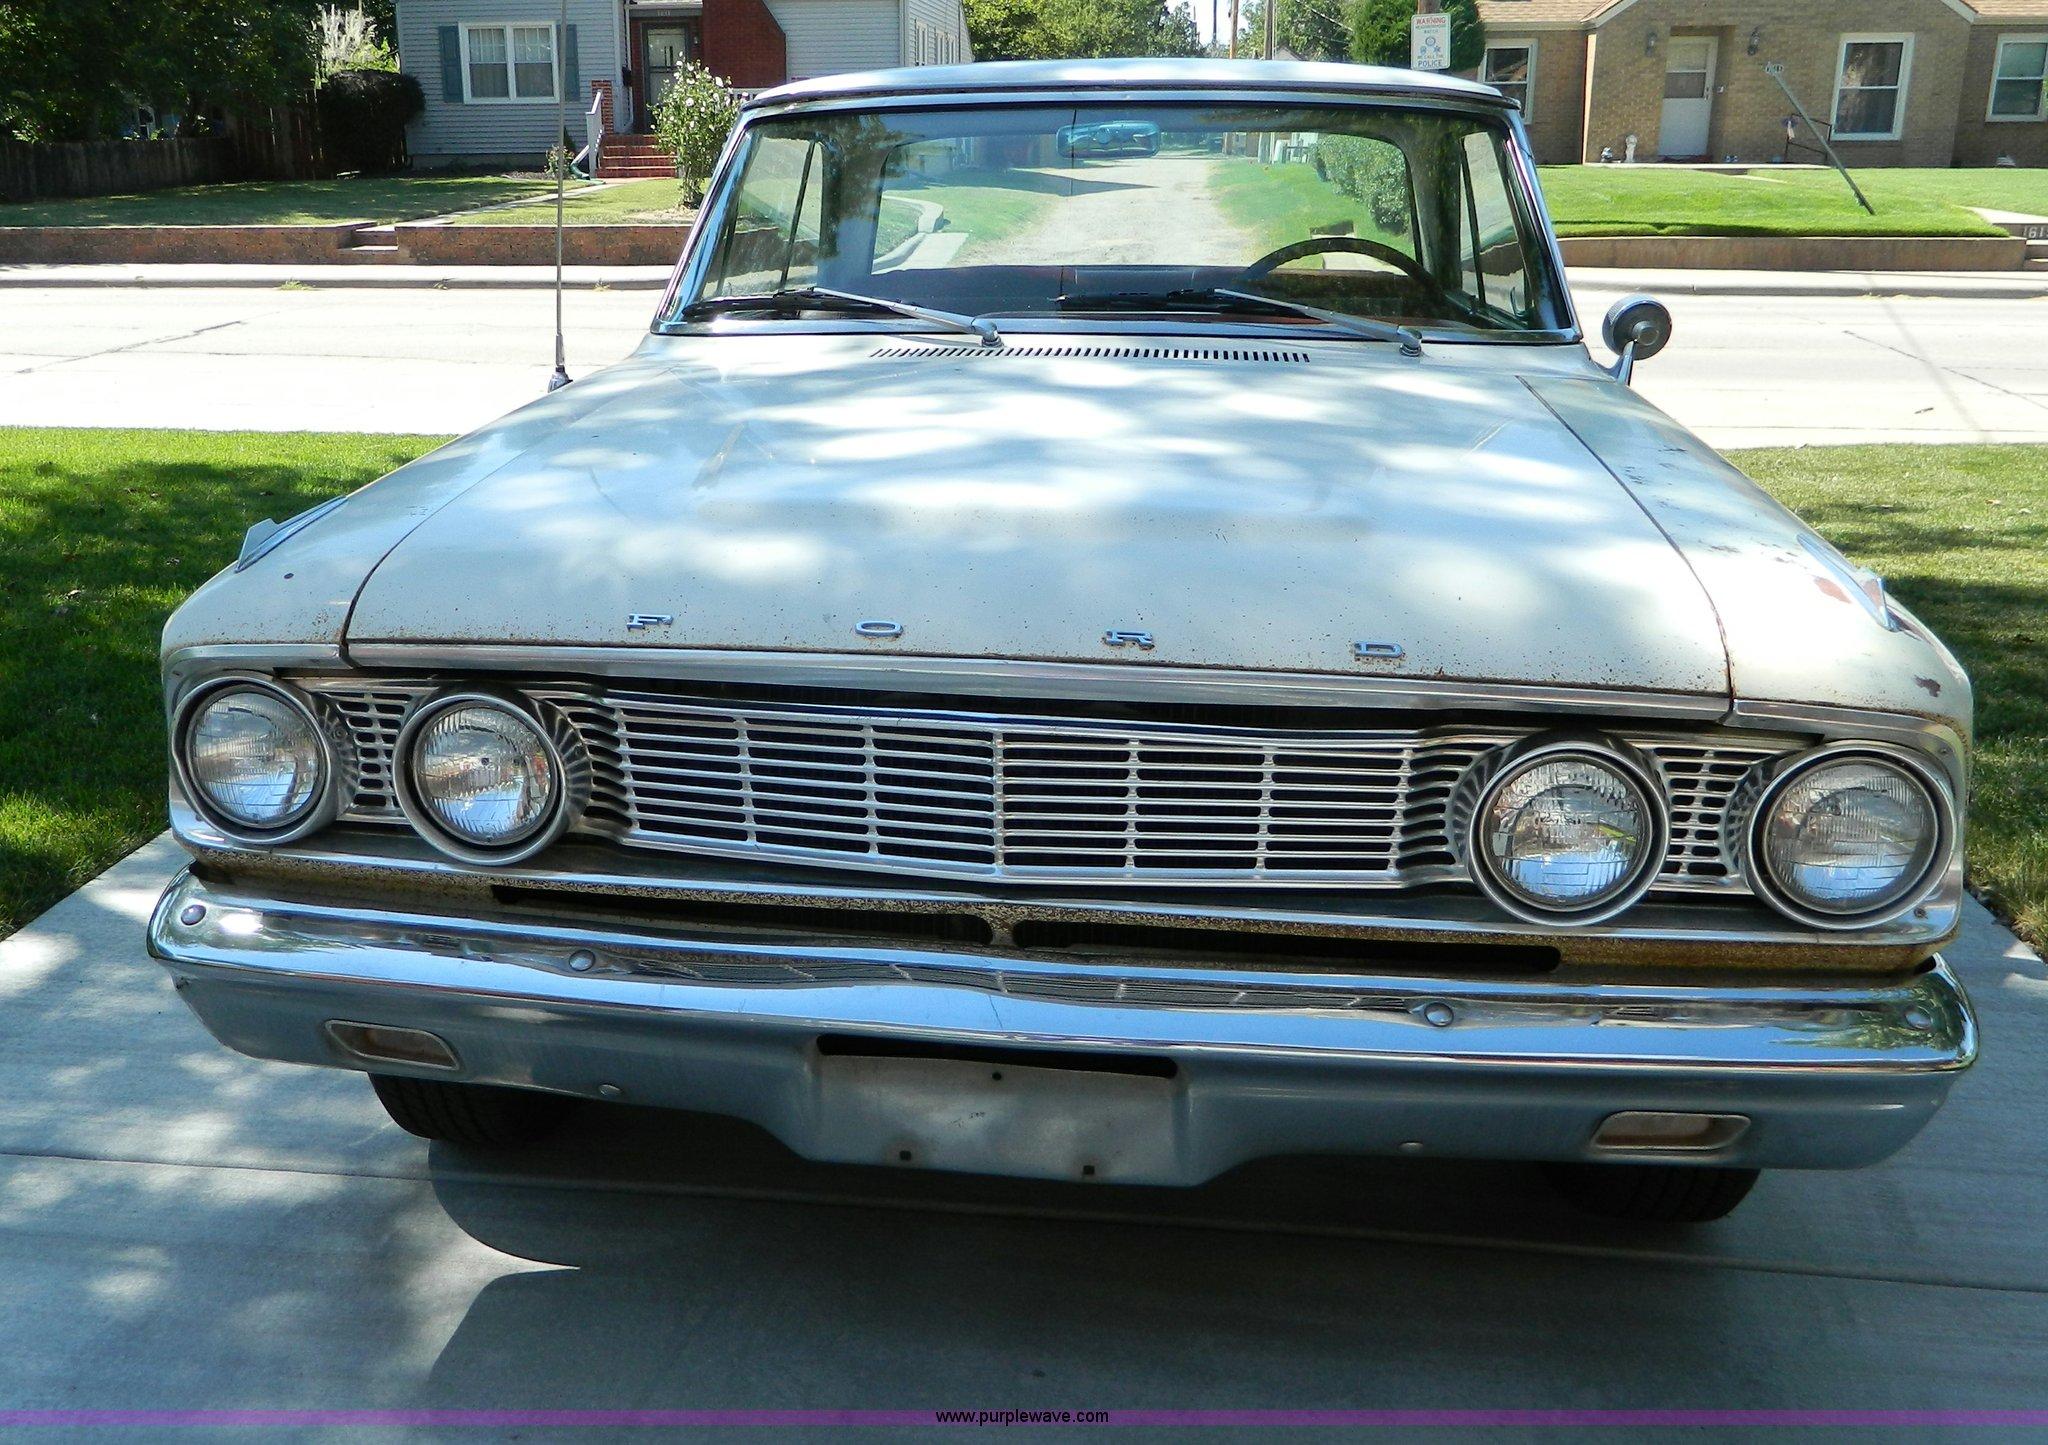 1964 Ford Fairlane 500 | Item D6032 | SOLD! October 16 Vehic